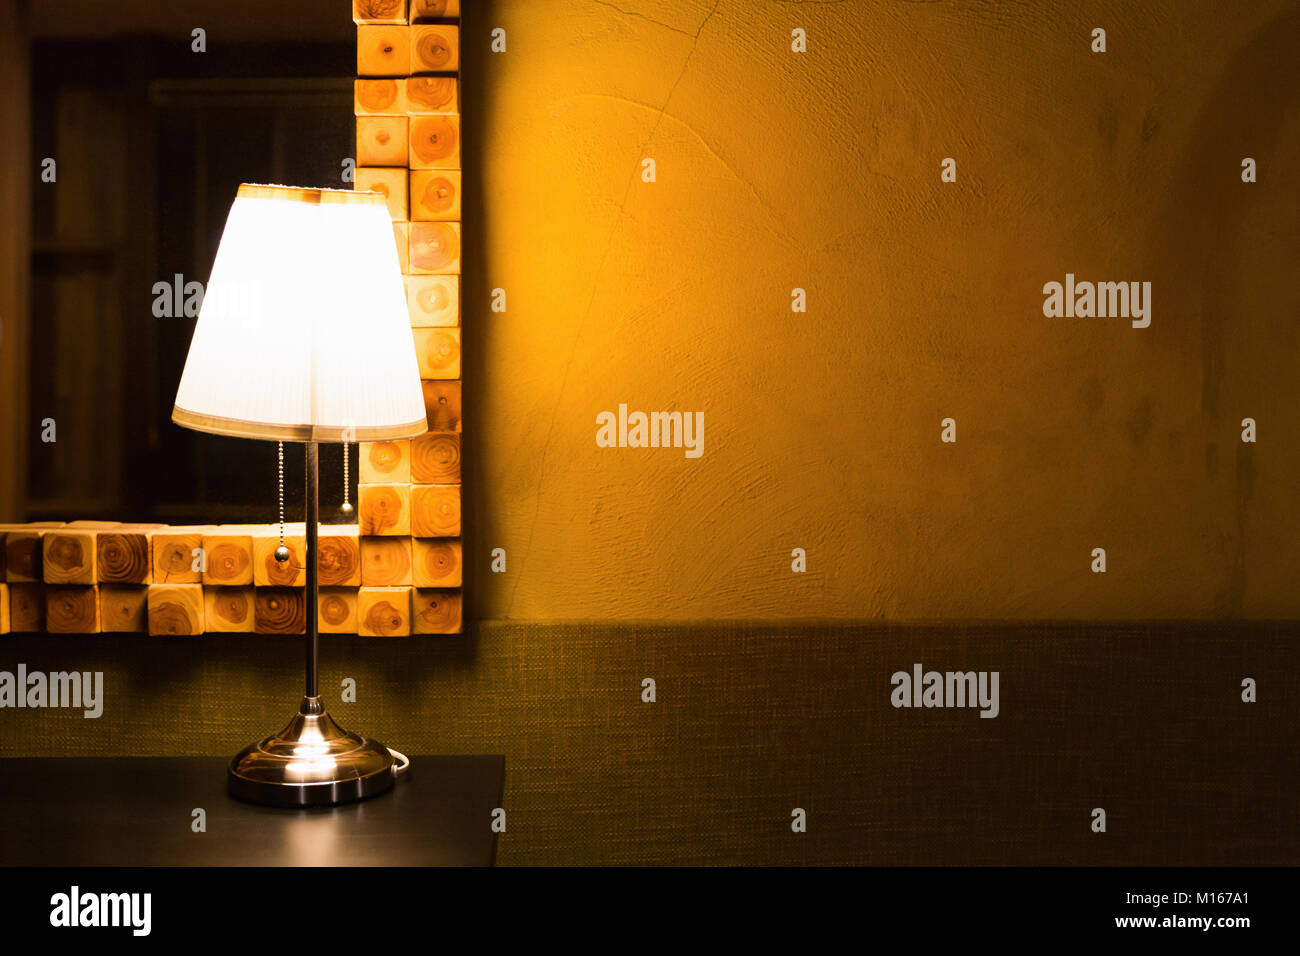 Plafoniere Da Parete Per Interni : Lampade da parete per scrivania powrgard